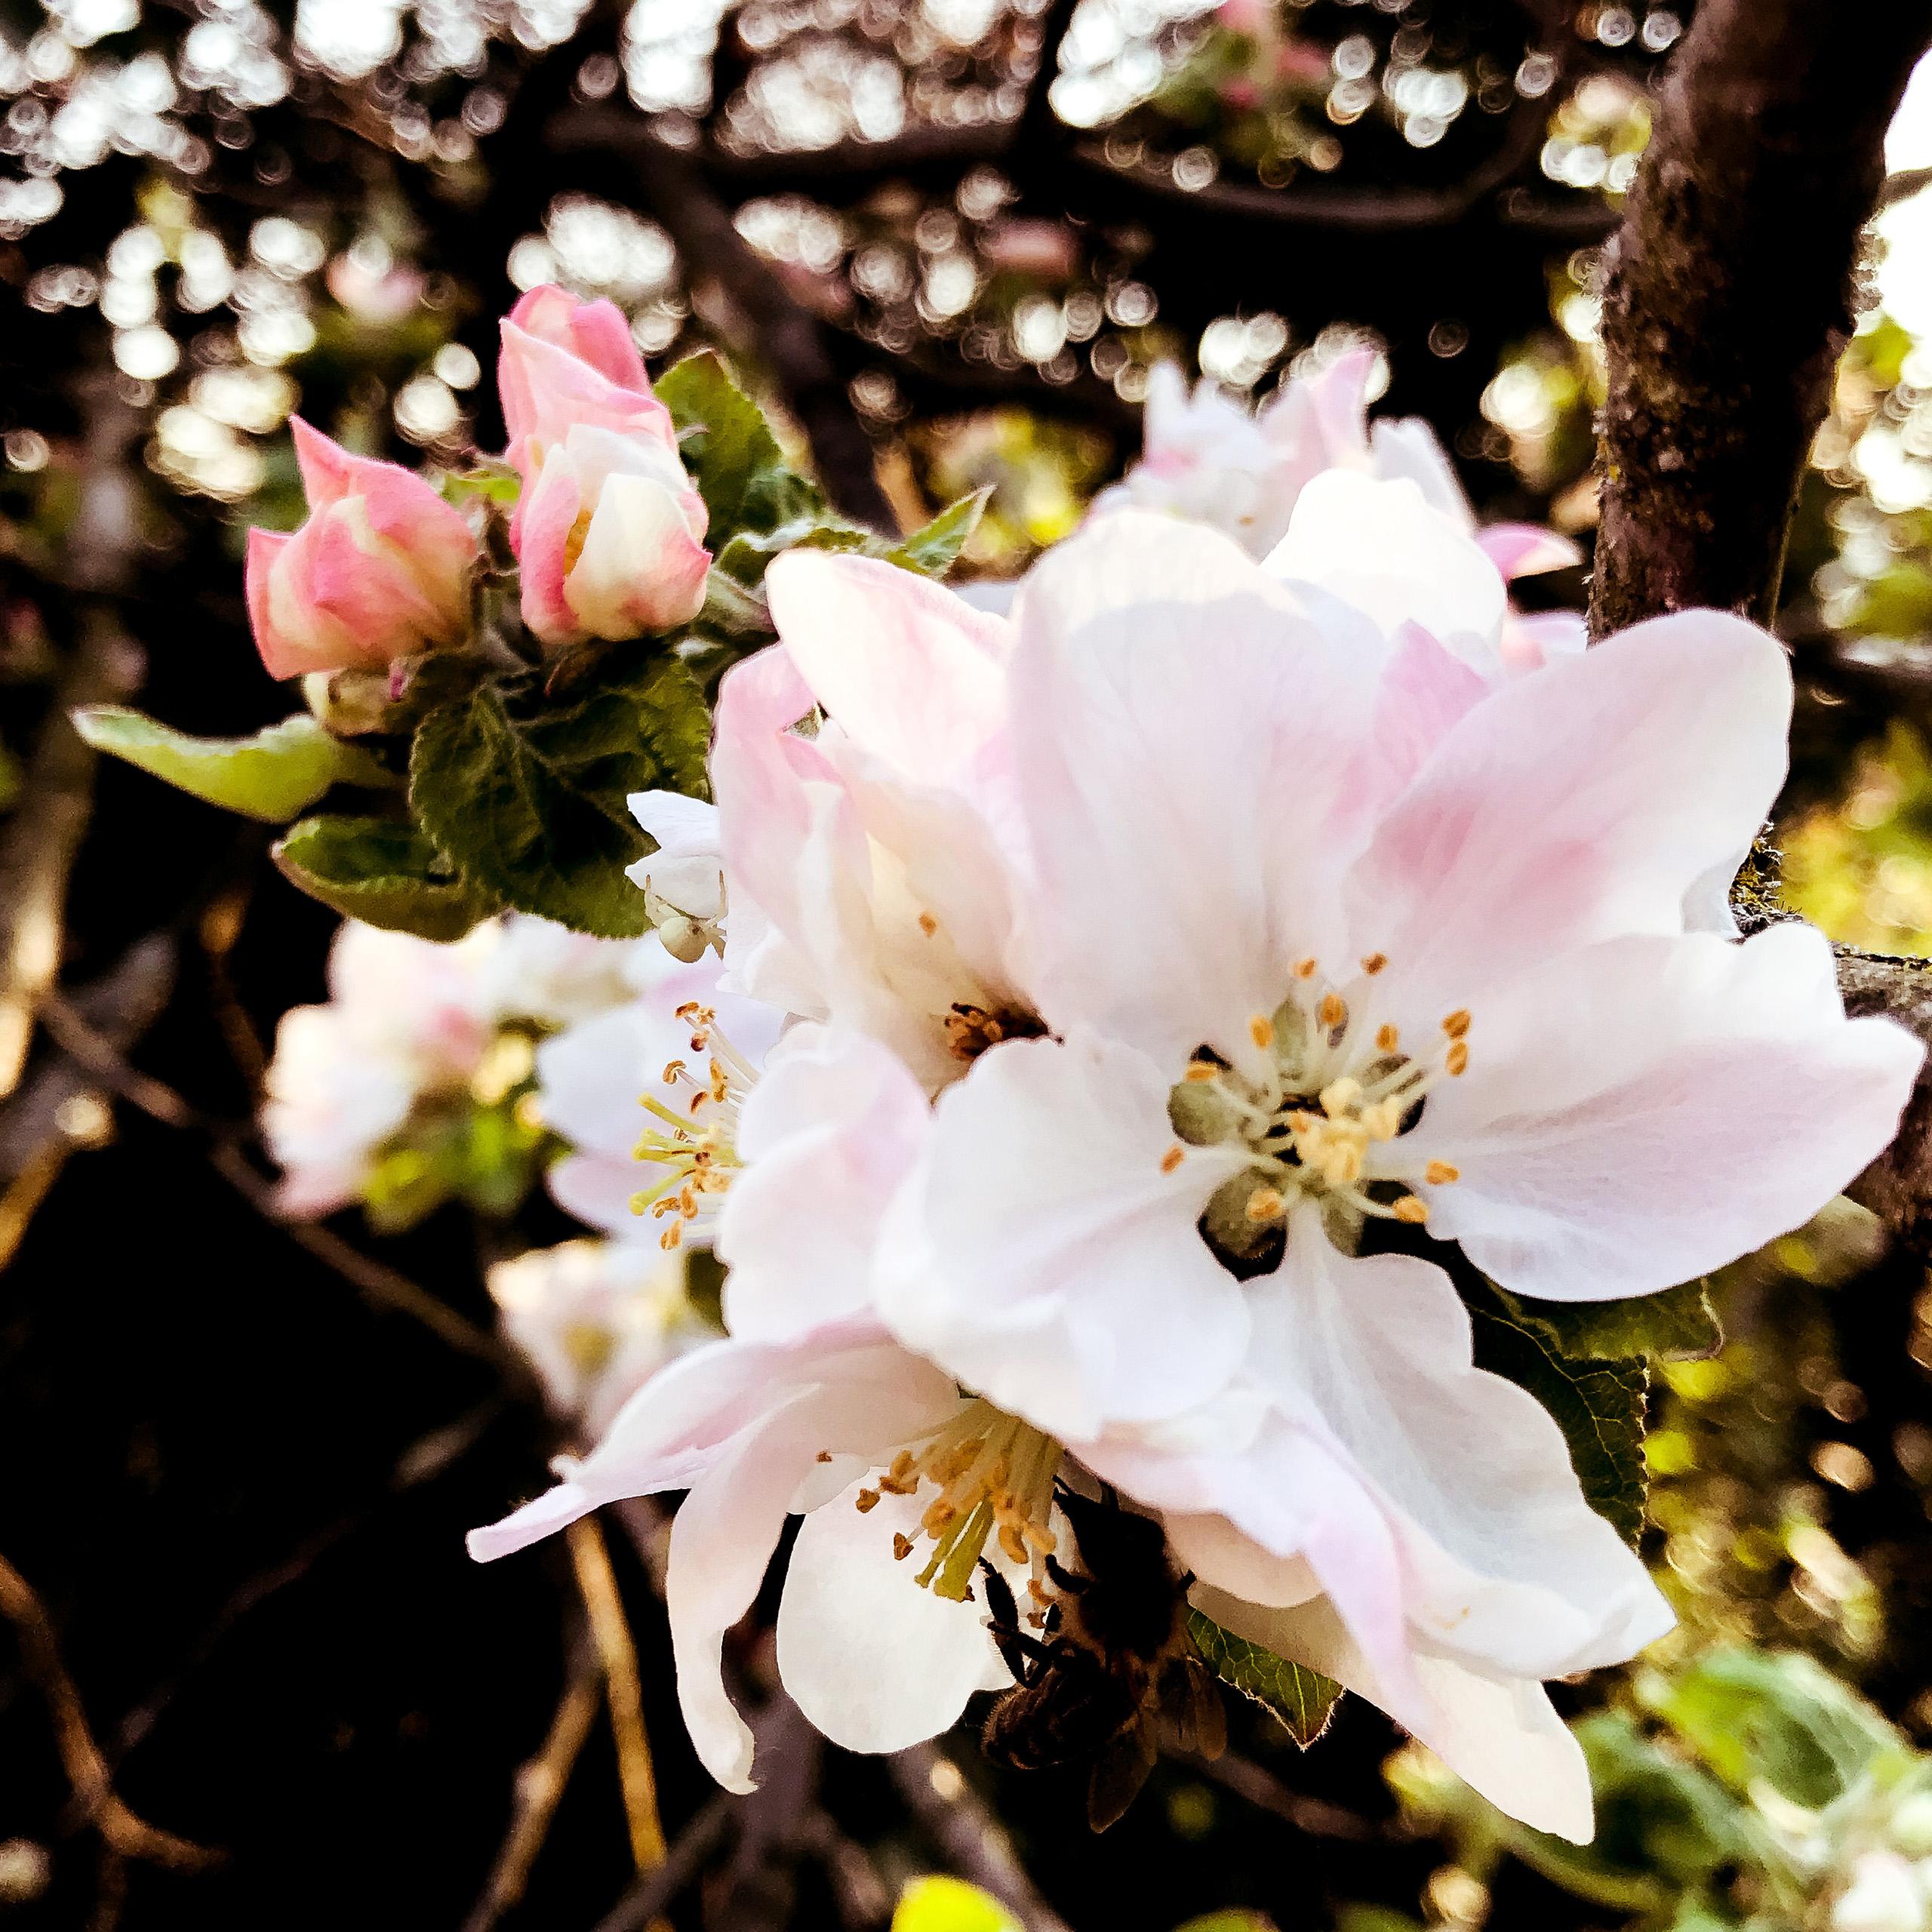 Apfelblüte. Bild: Florian Stocker